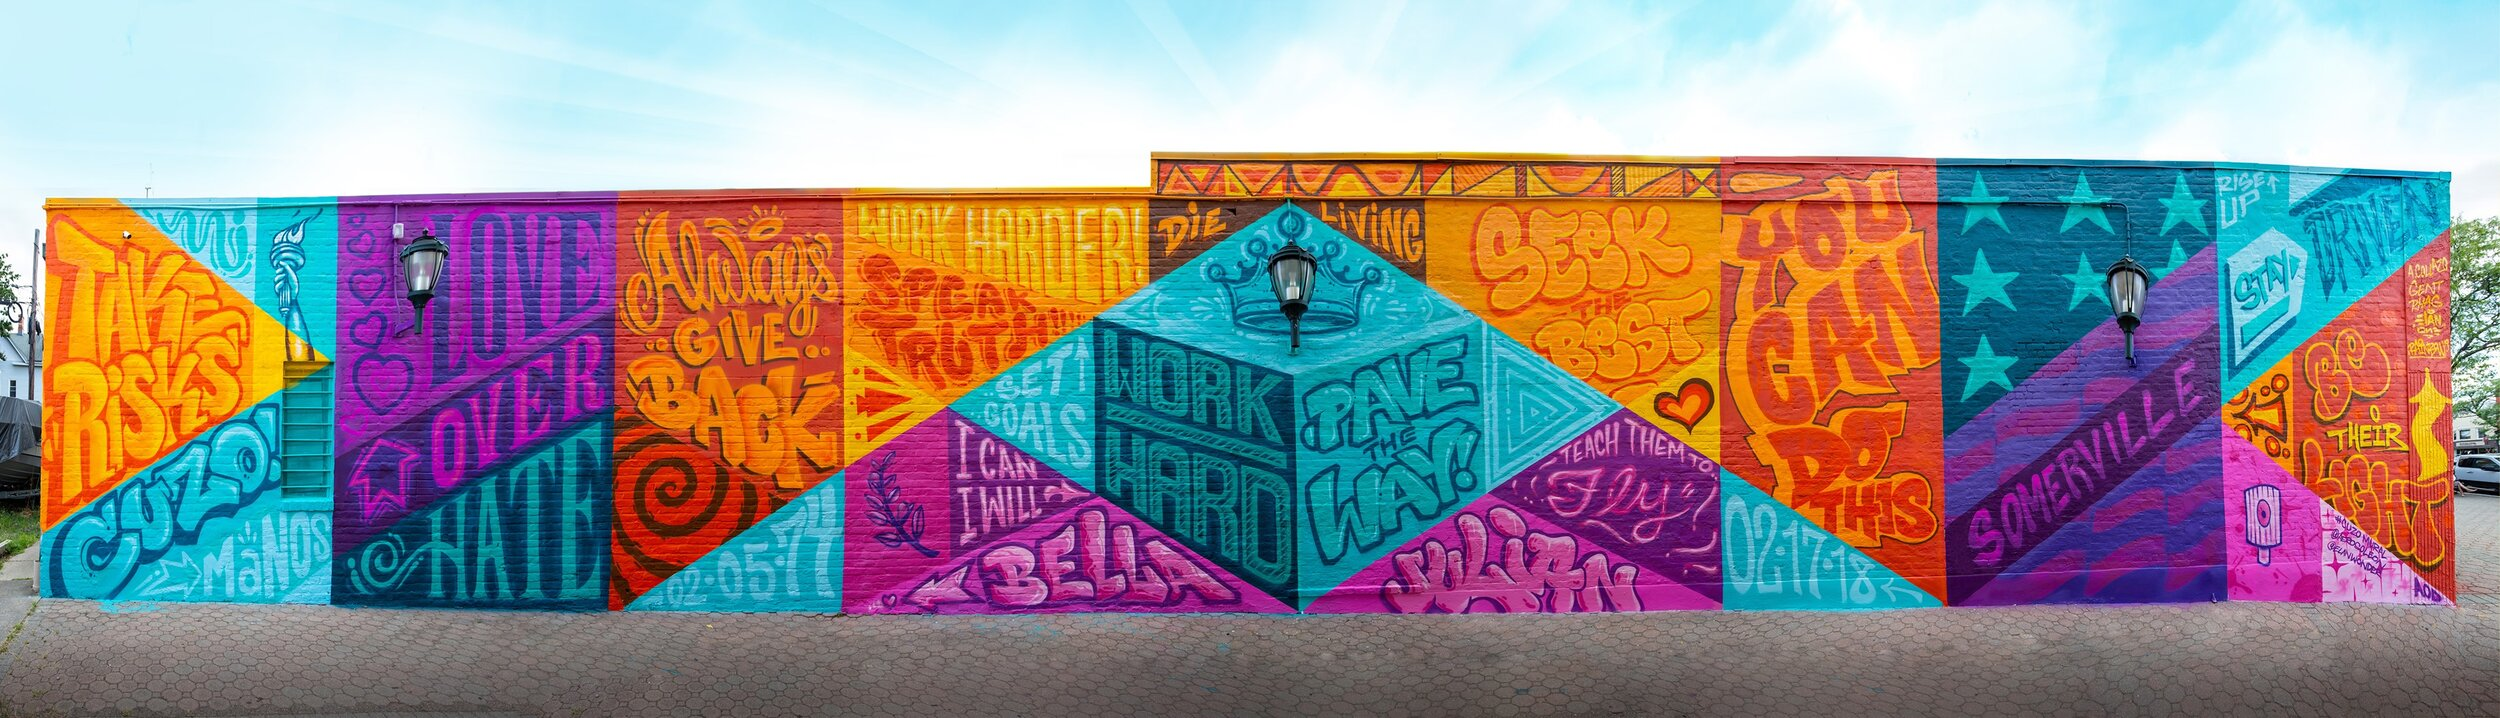 Mural_Photo-by-Arielle-Figueredo.jpg